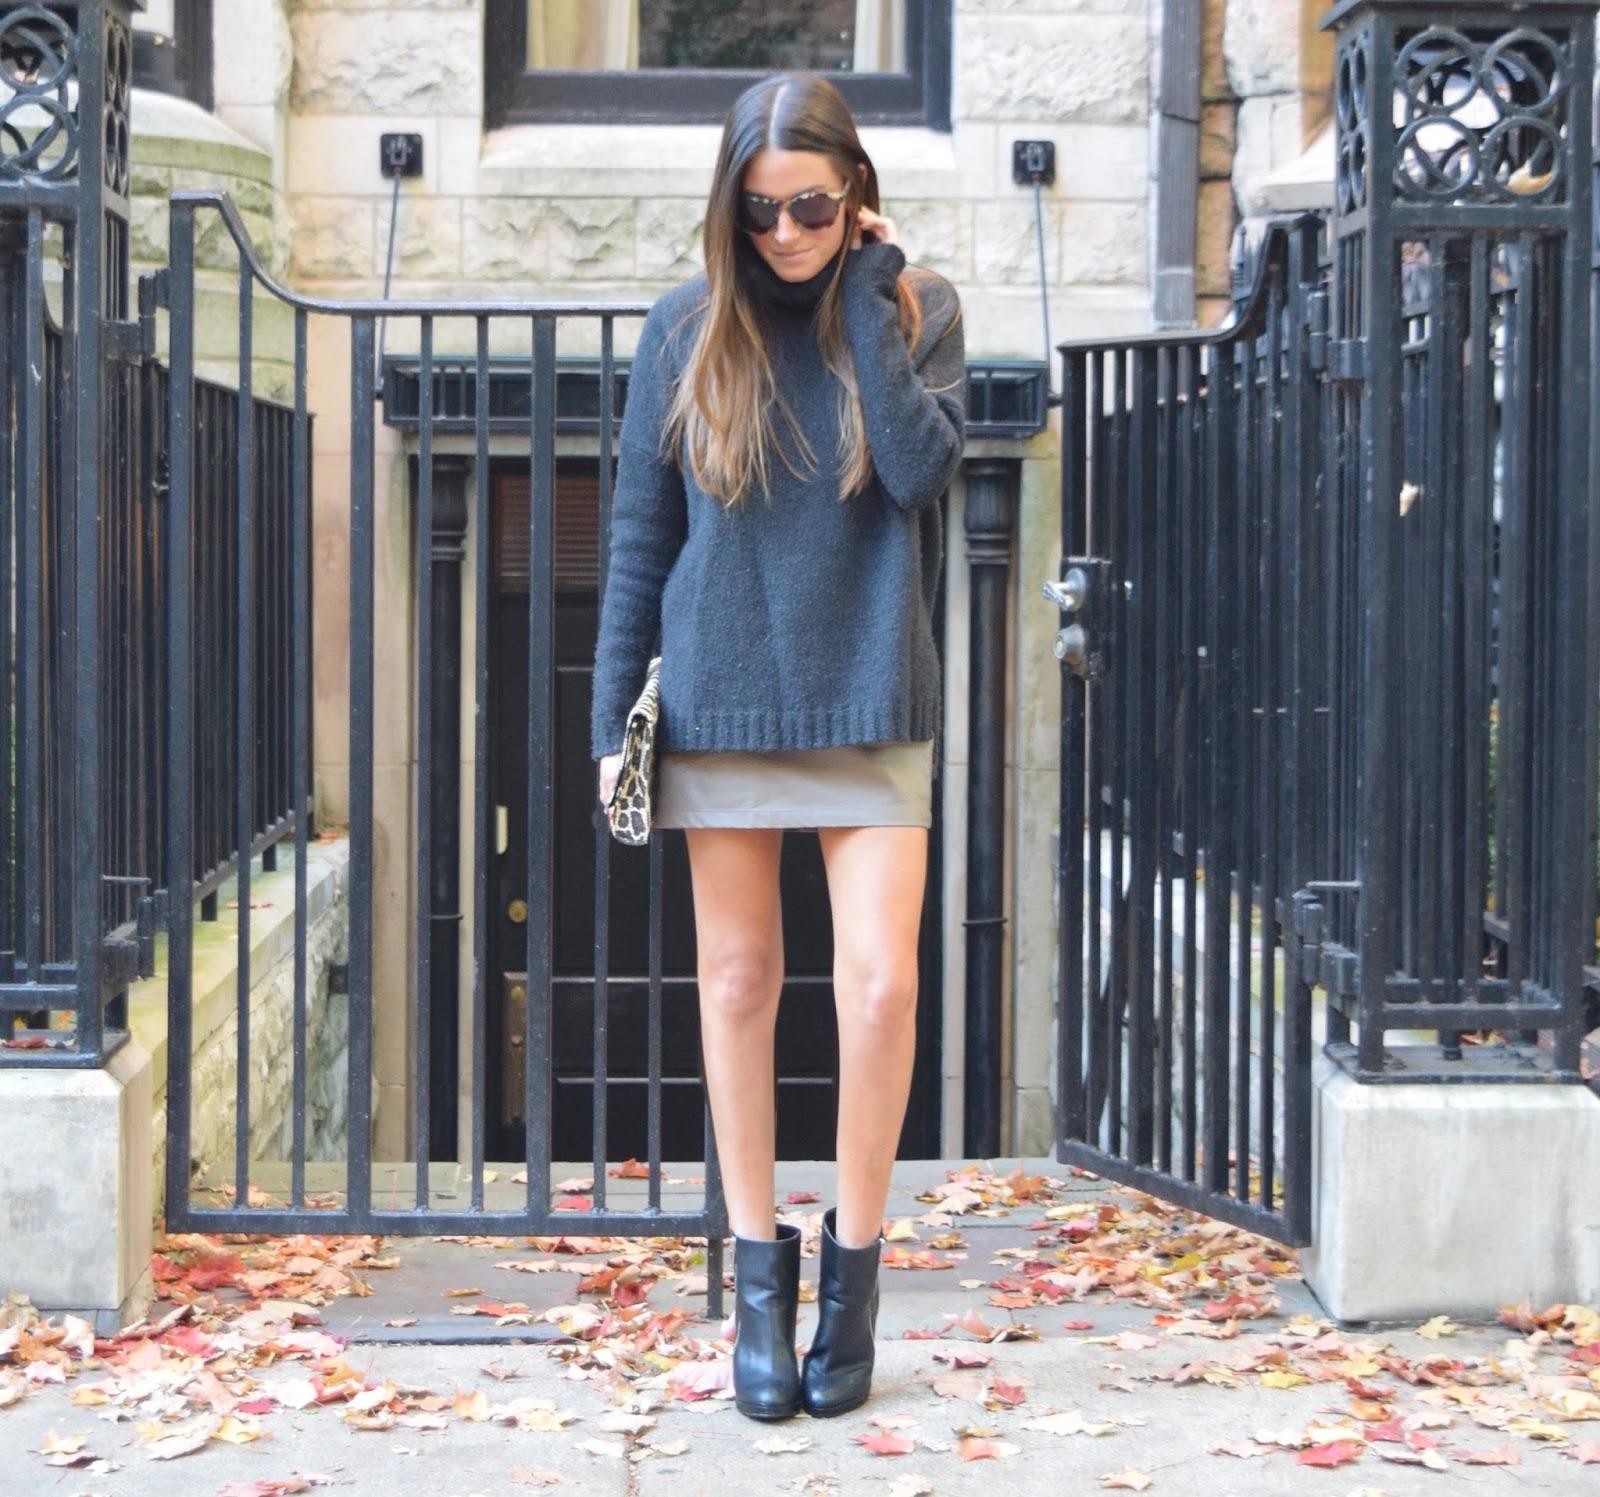 c26080d7df By Shanna  oversized sweaters x mini skirt